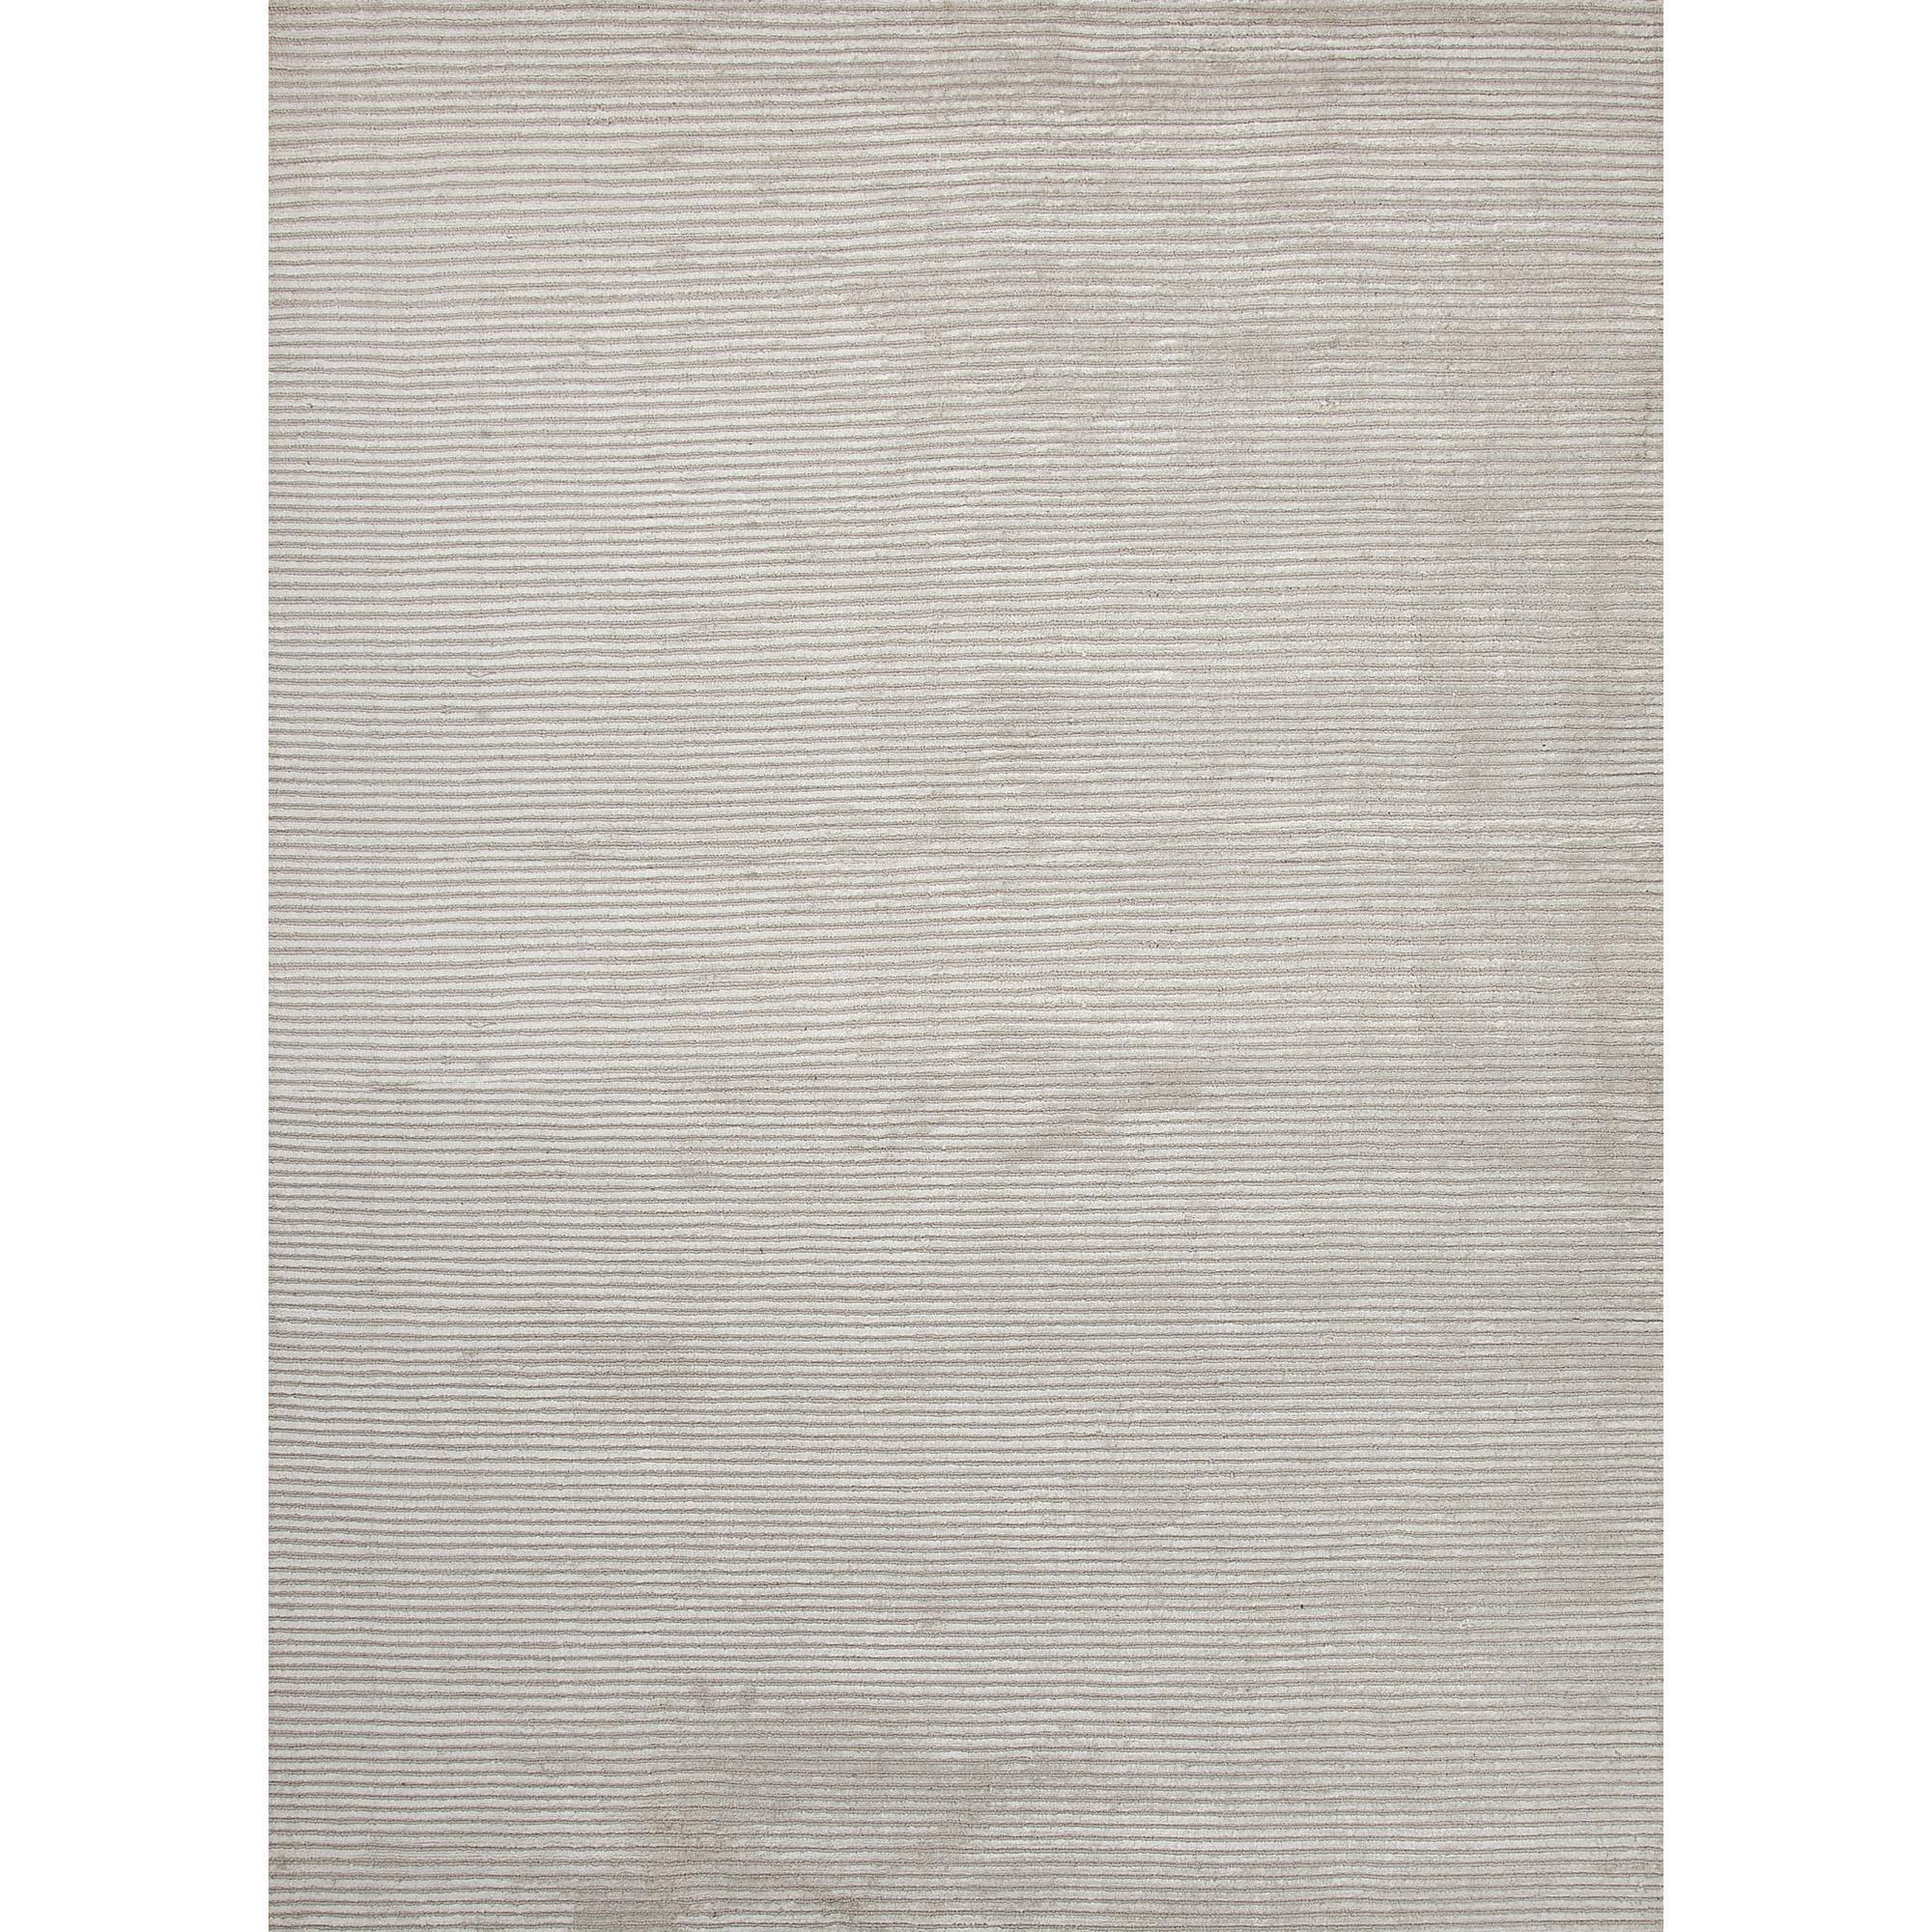 Basis 8 x 10 Rug by JAIPUR Living at Malouf Furniture Co.